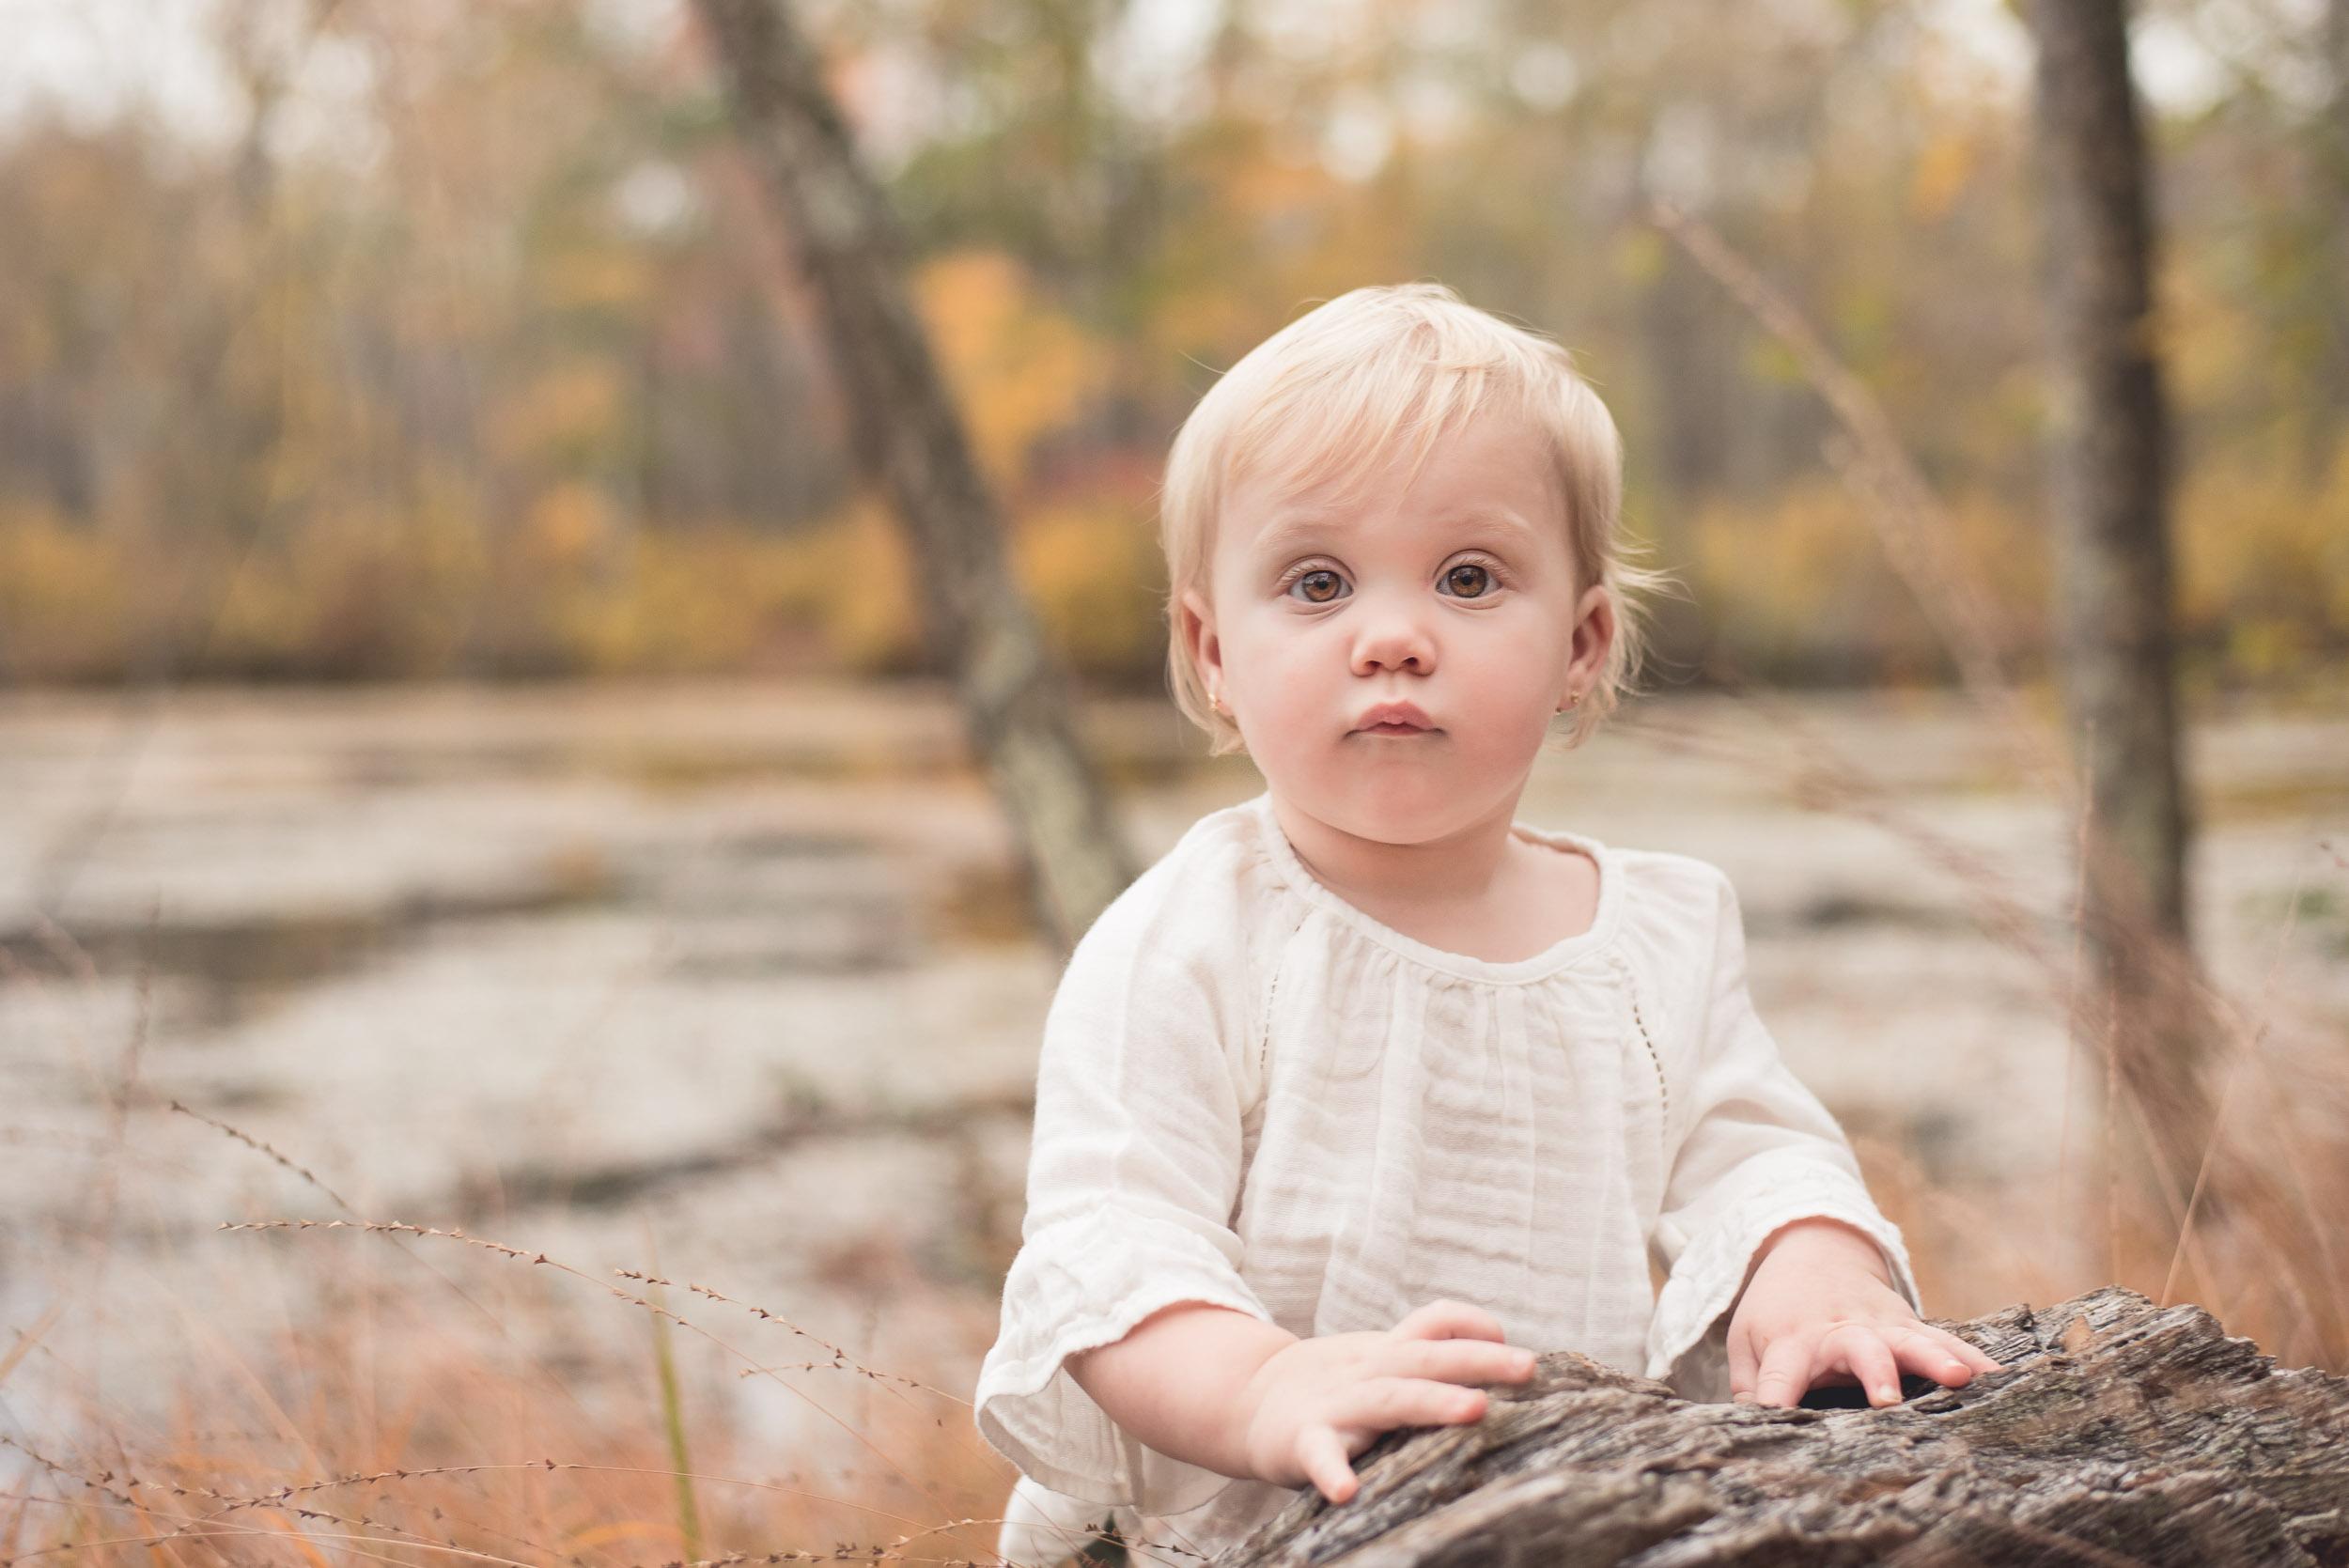 Ramsey_Child_Family_Photo_Session_Maryland_Crofton_Gambrills(2of12).jpg